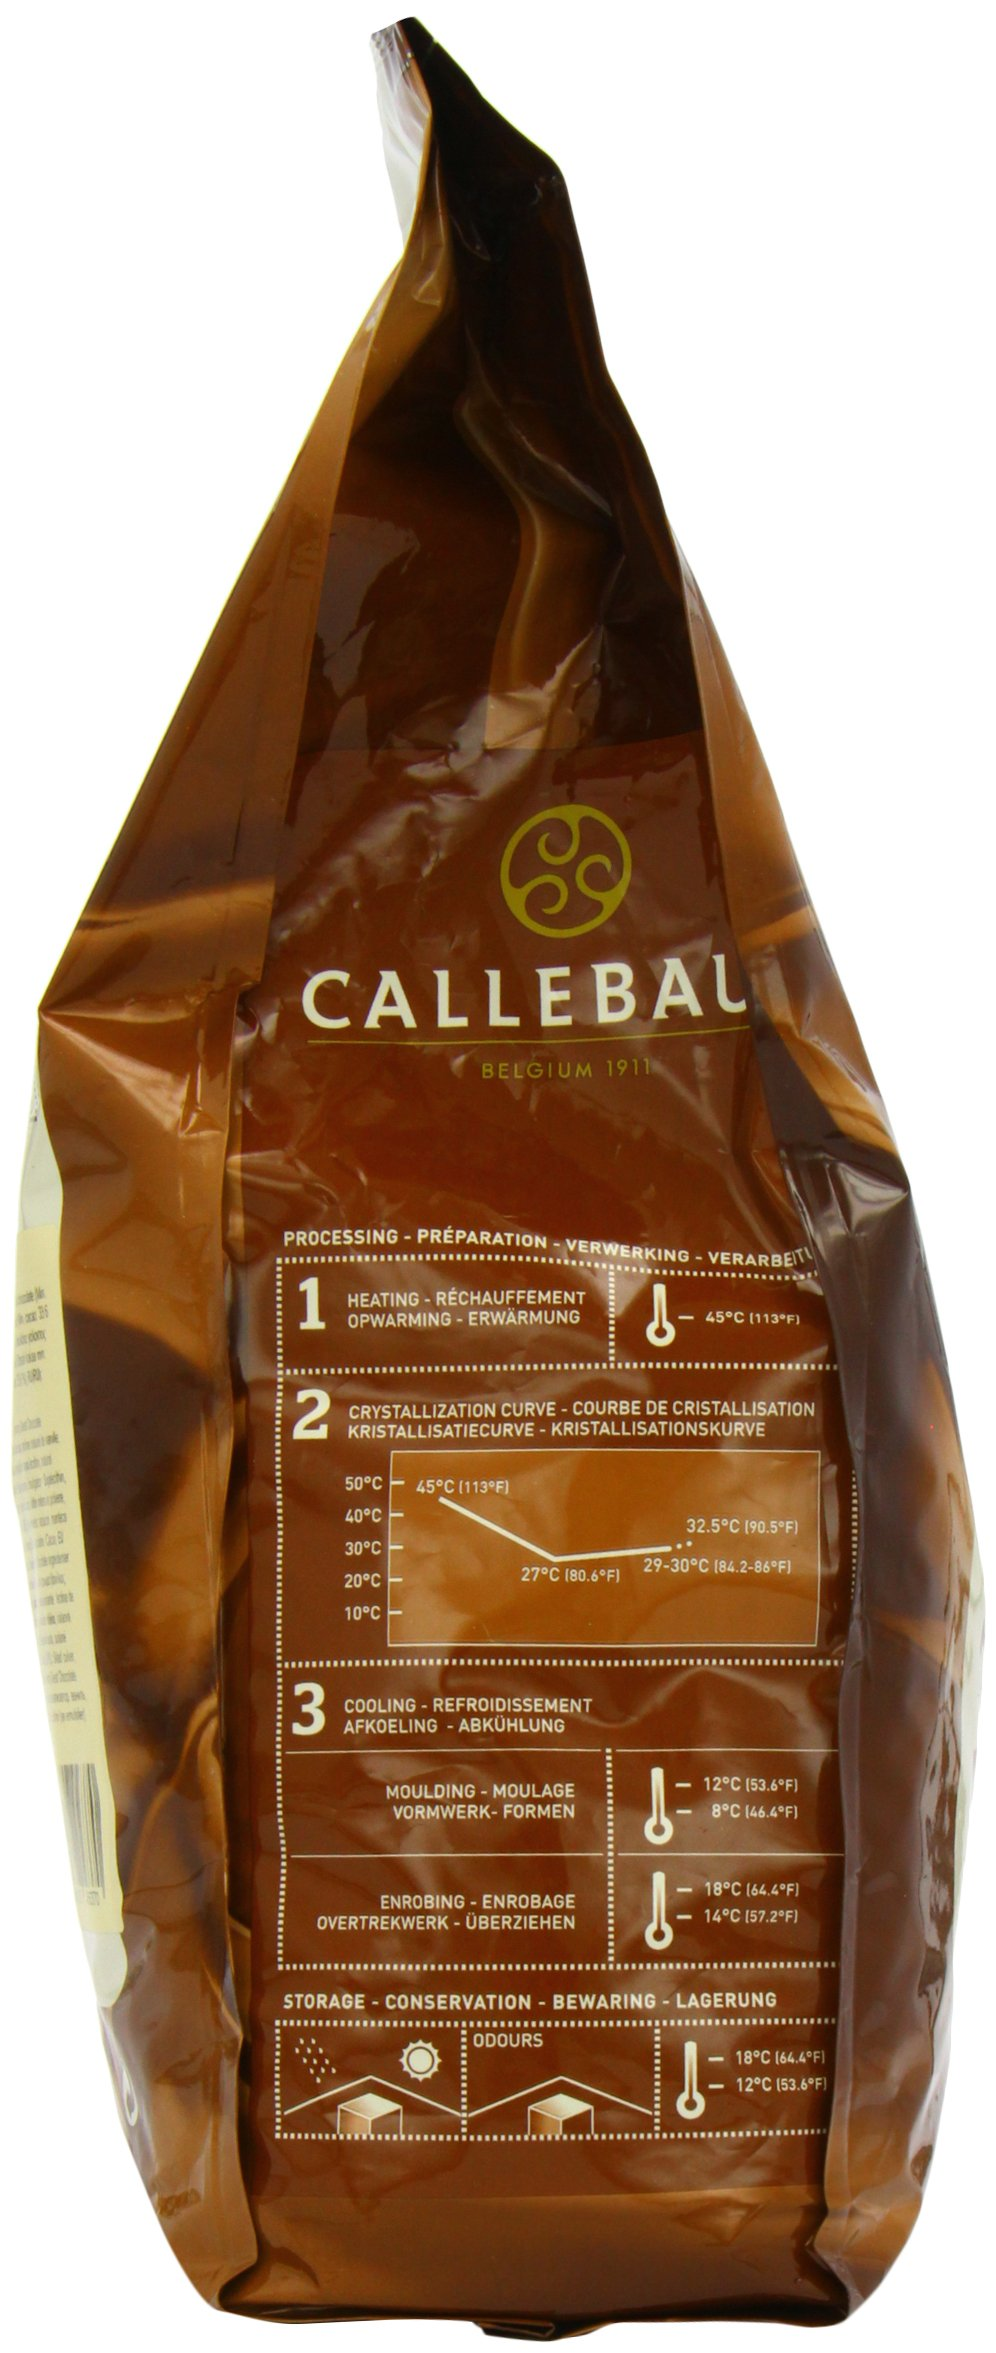 Belgian Milk Chocolate Baking Callets (Chips) - 33.6% - 1 bag, 5.5 lbs by Callebaut (Image #6)